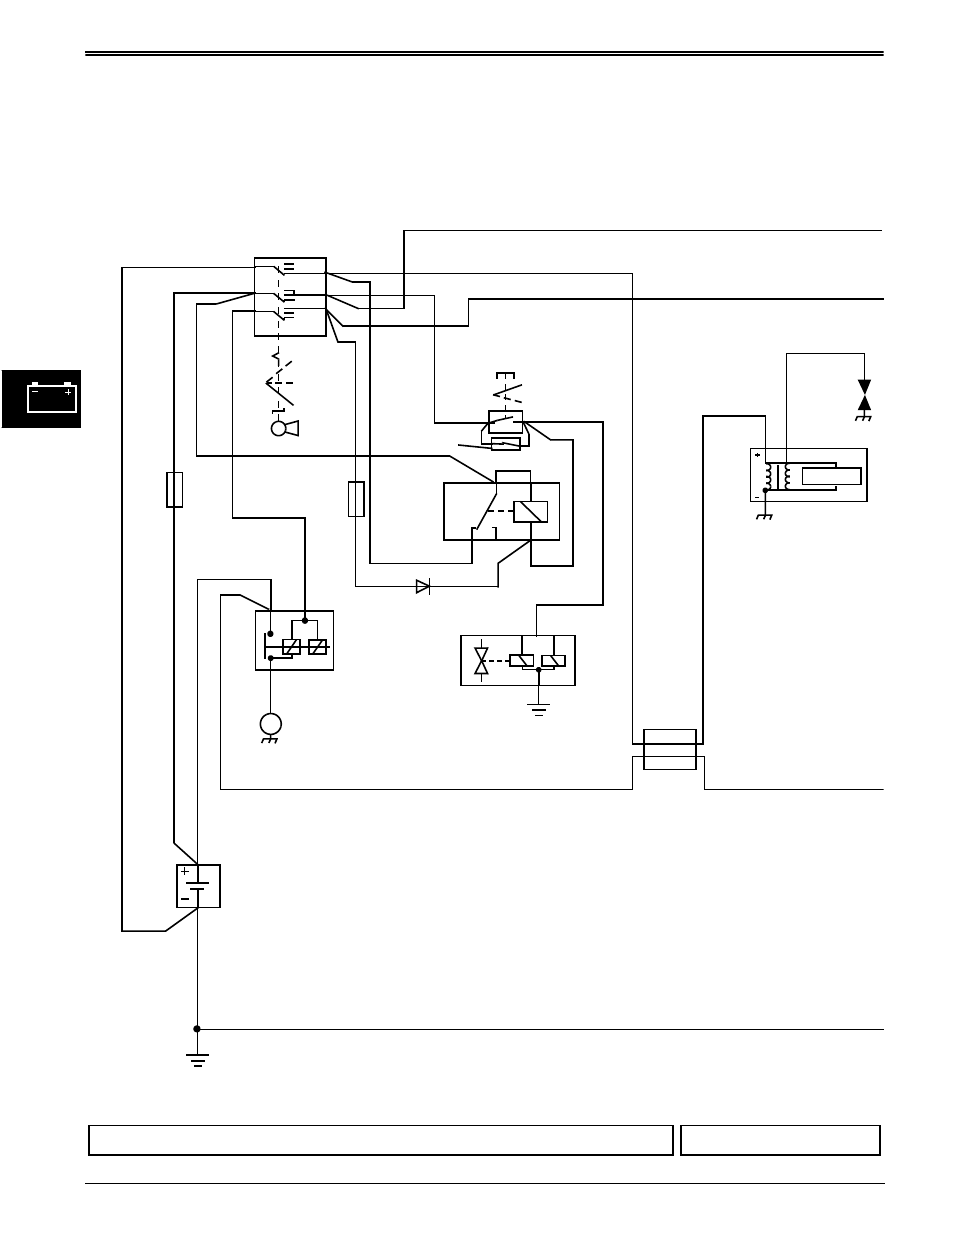 hight resolution of wiring schematics john deere stx38 user manual page 102 314